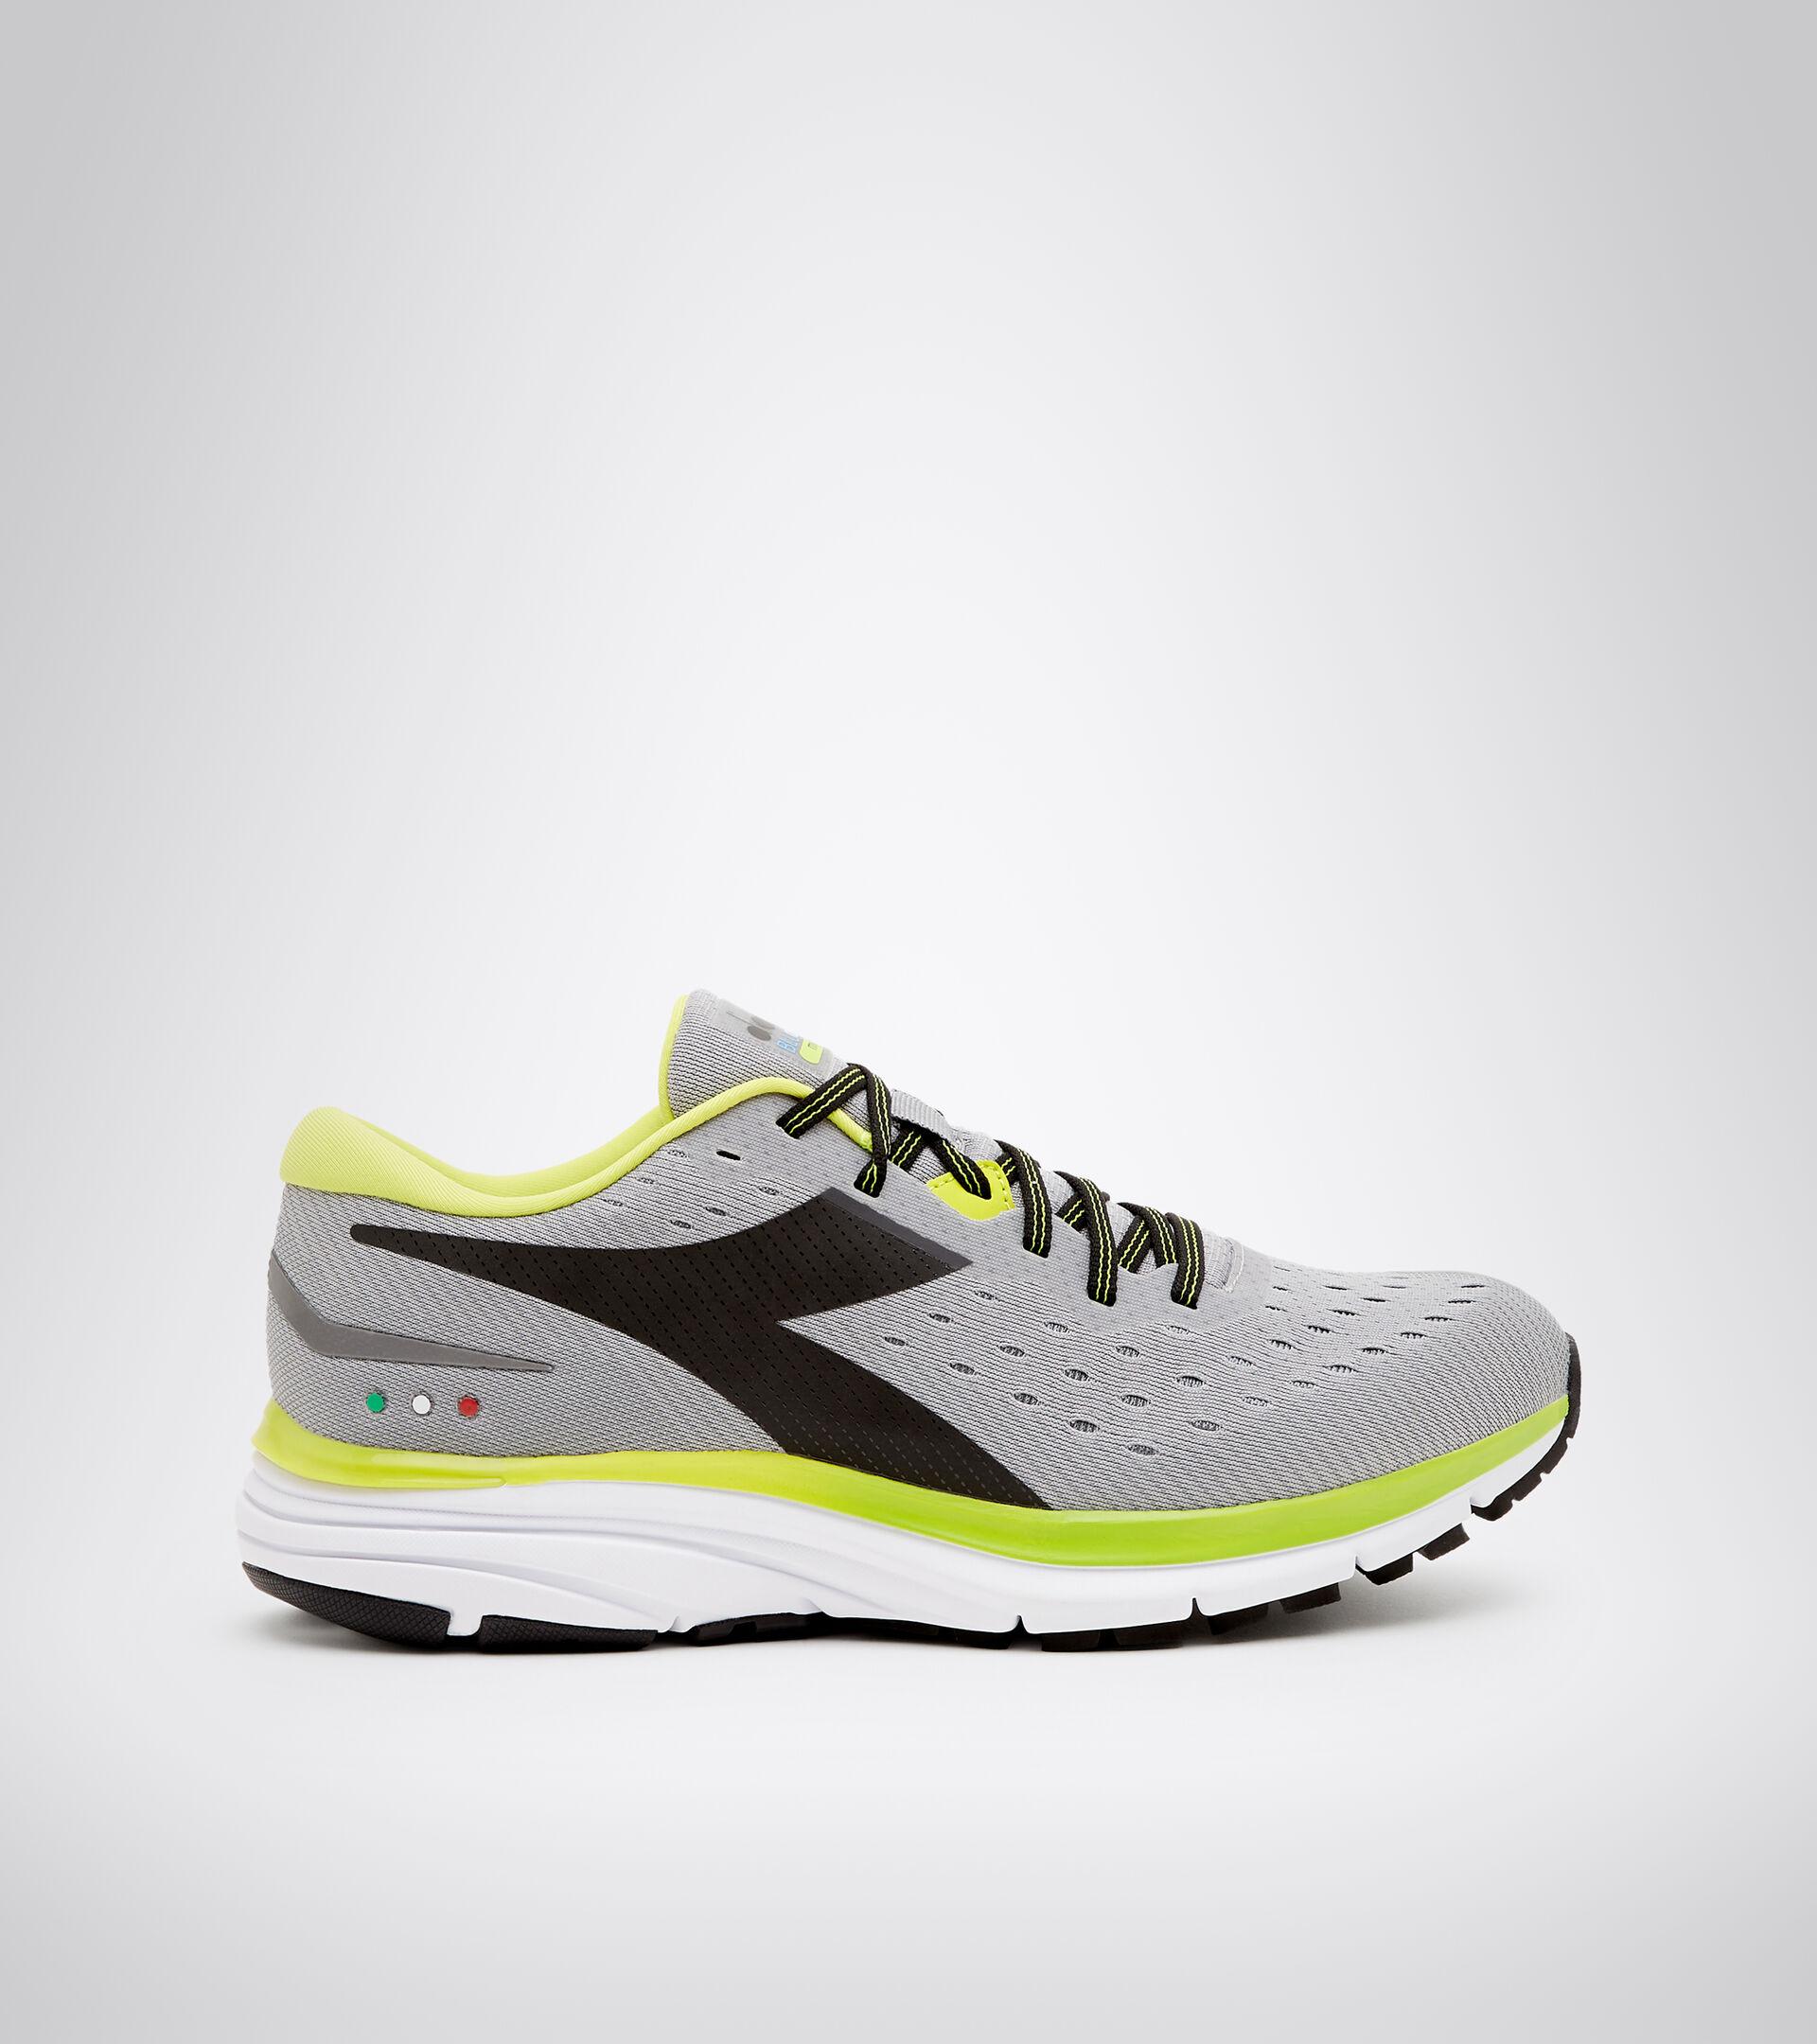 Footwear Sport UOMO MYTHOS BLUSHIELD 6 GRIS ALEACION/GRIS ACERO/NEGRO Diadora